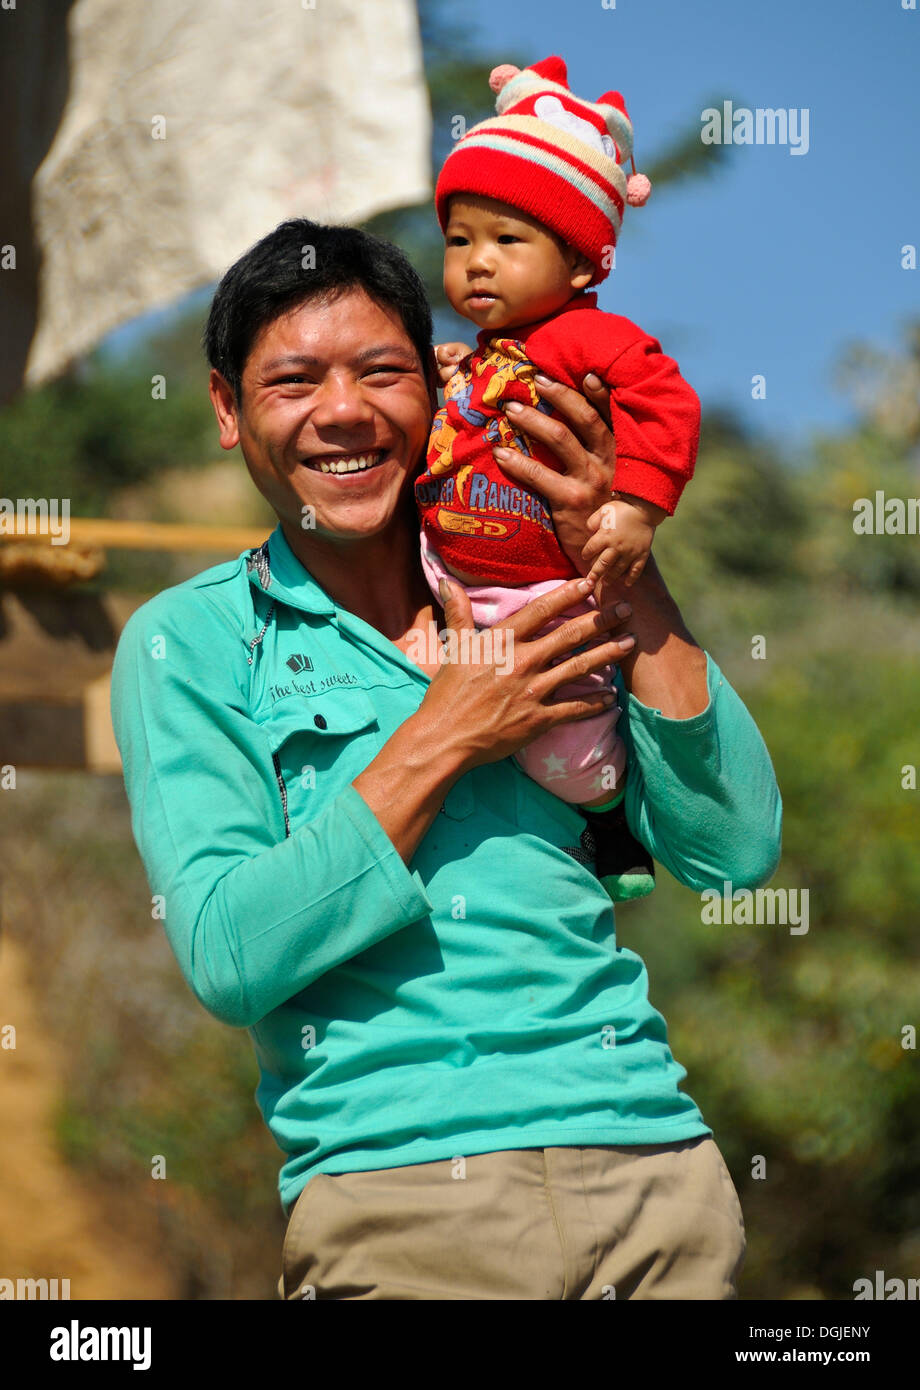 Father and child, ethnic minority, Mai Chau Valley, Vietnam, Asia - Stock Image